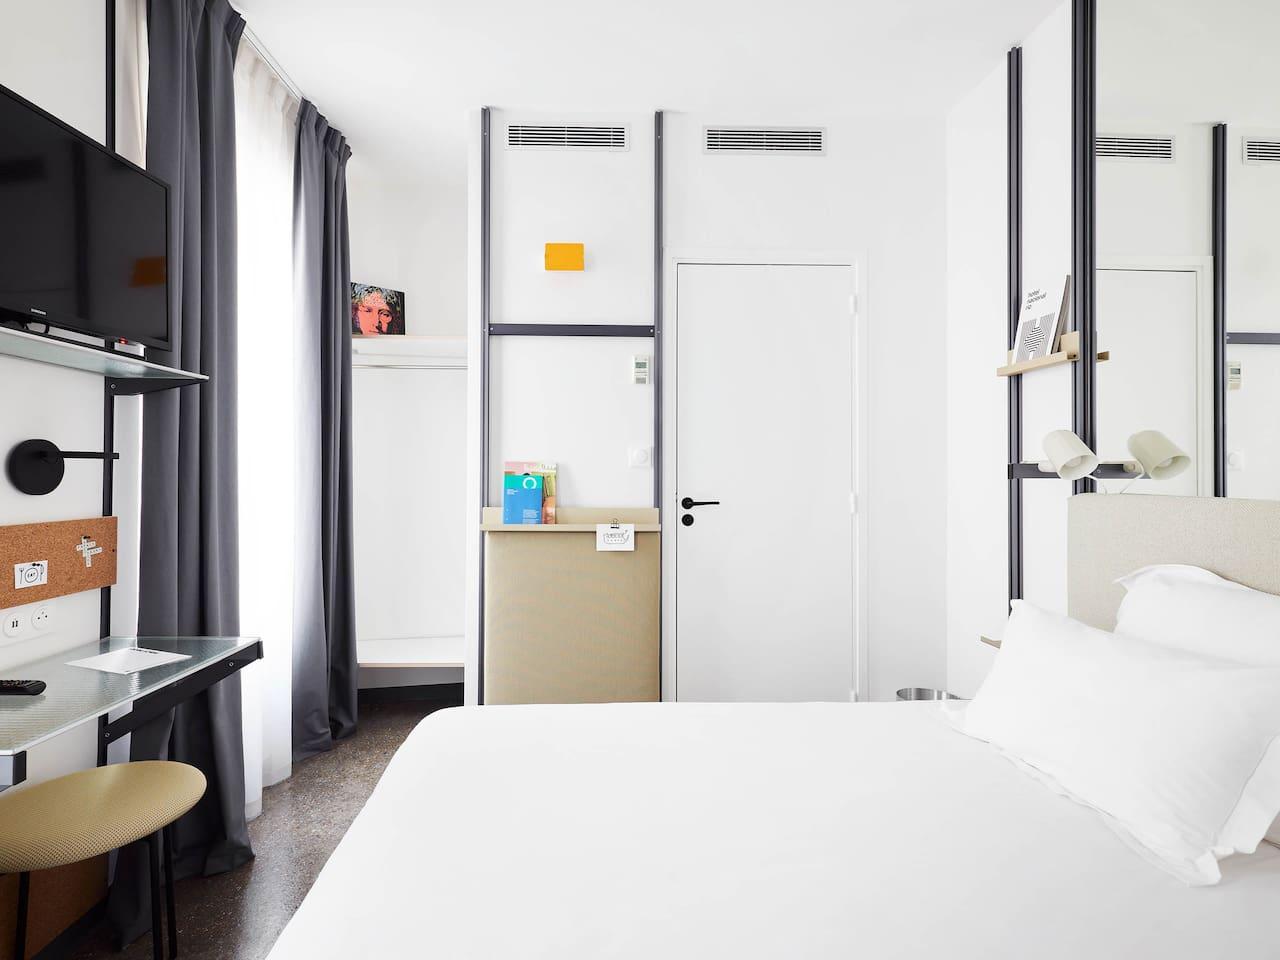 The Bedroom - La chambre